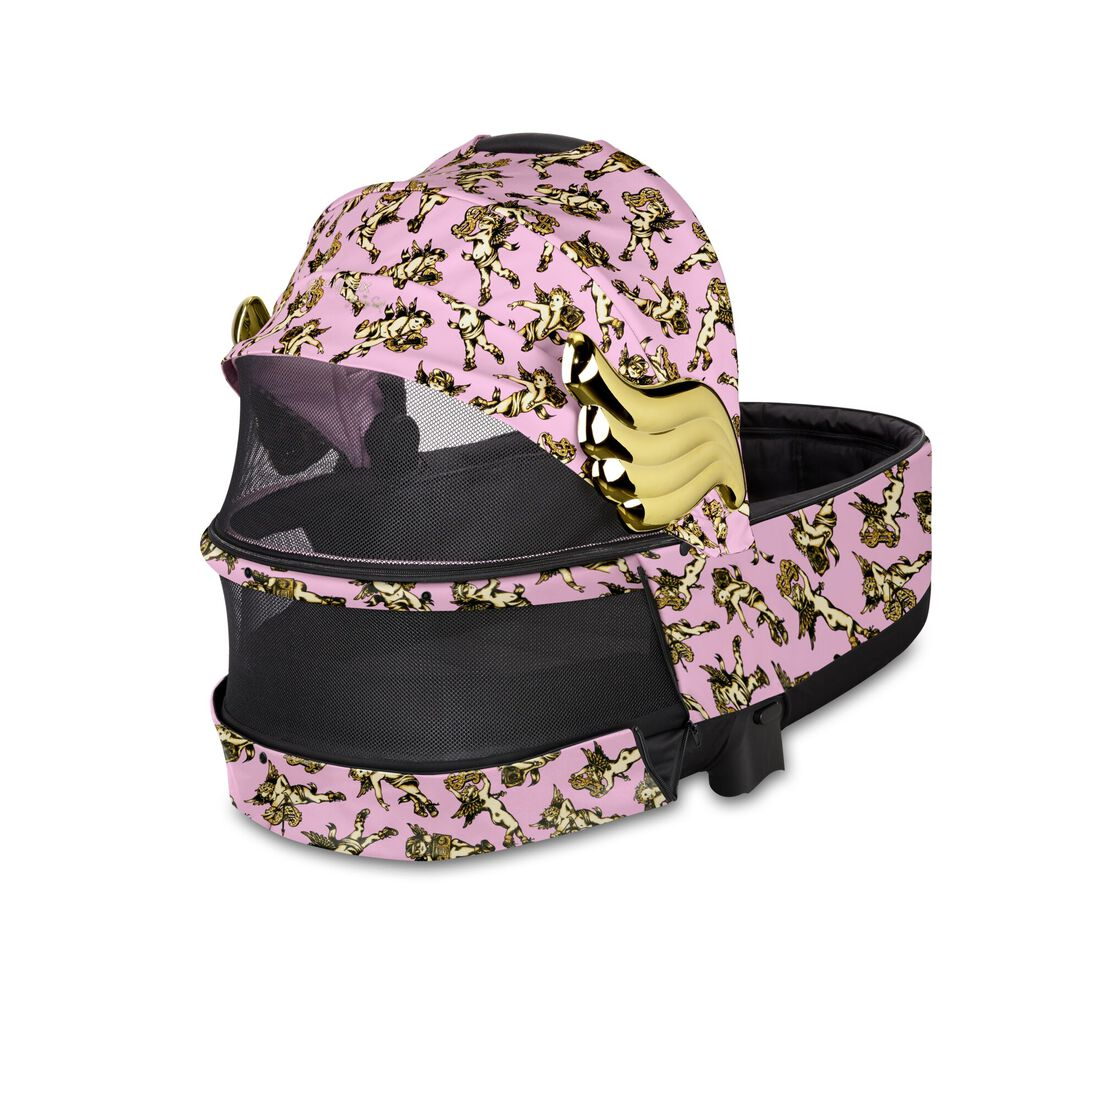 CYBEX Priam Lux Carry Cot - Cherubs Pink in Cherubs Pink large Bild 3